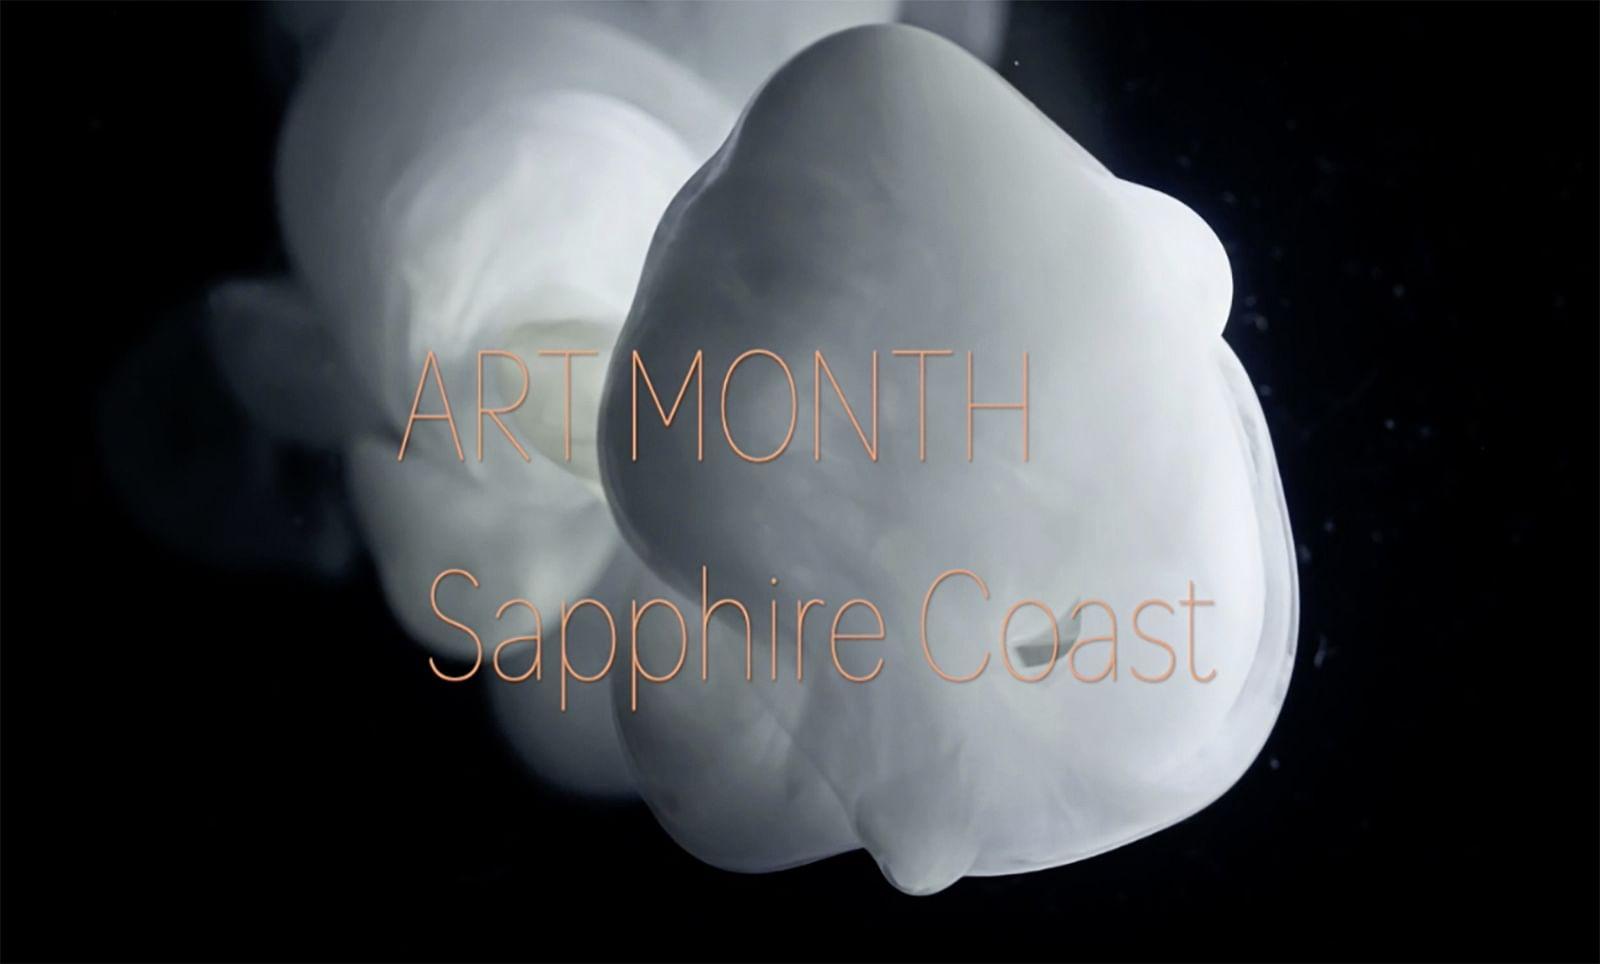 Art Month Sapphire Coast